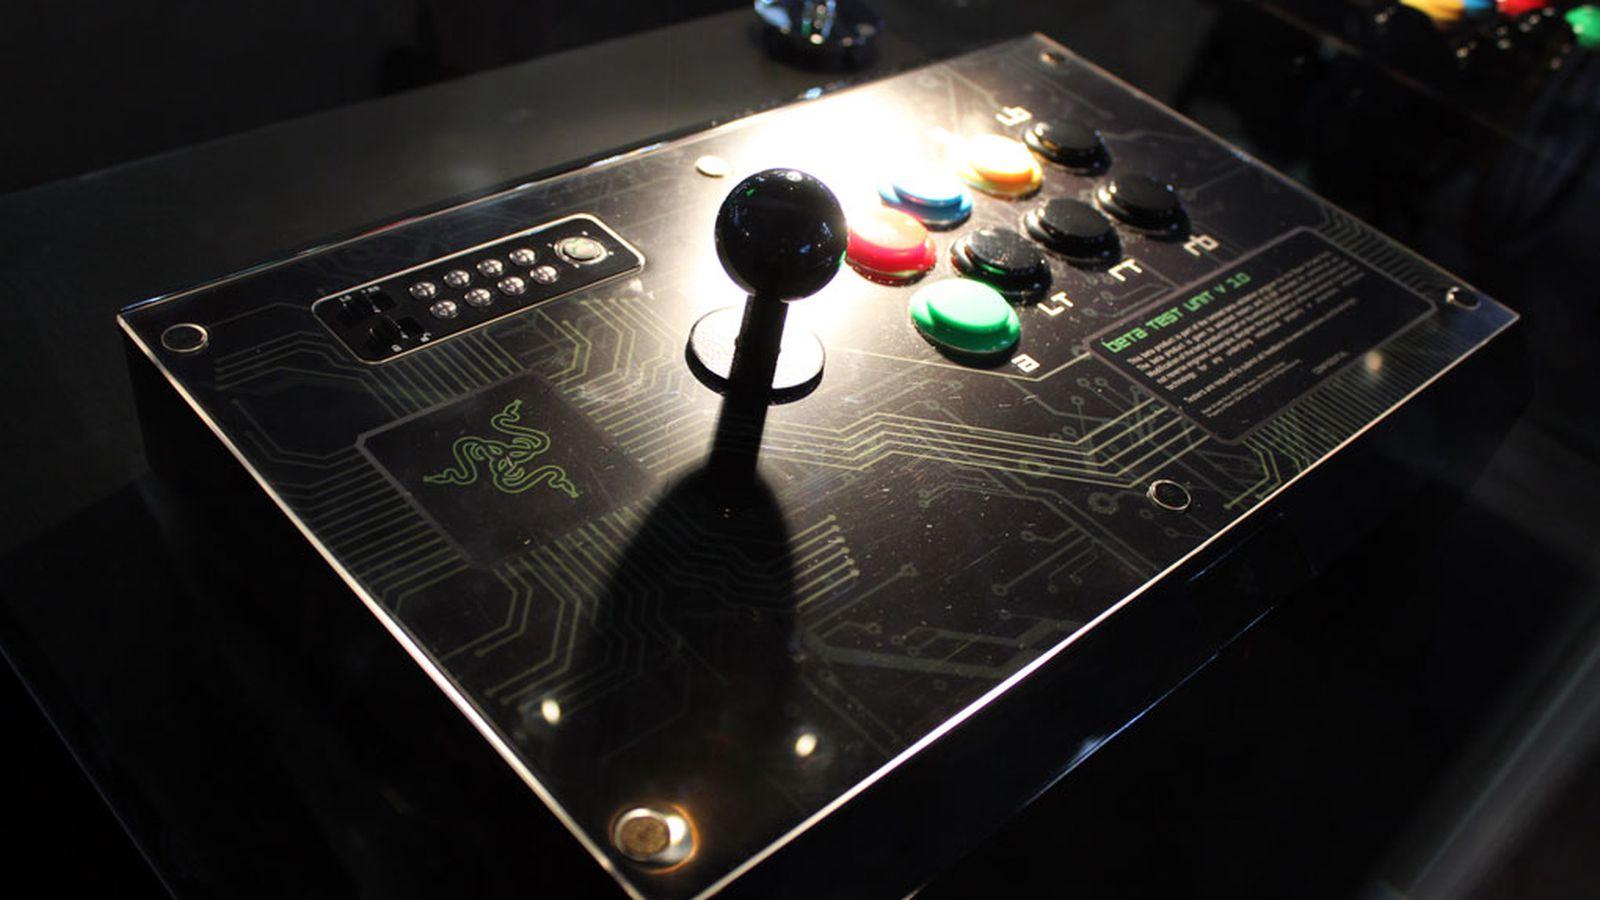 Razer Arcade Stick handson a better joystick even in beta  Polygon